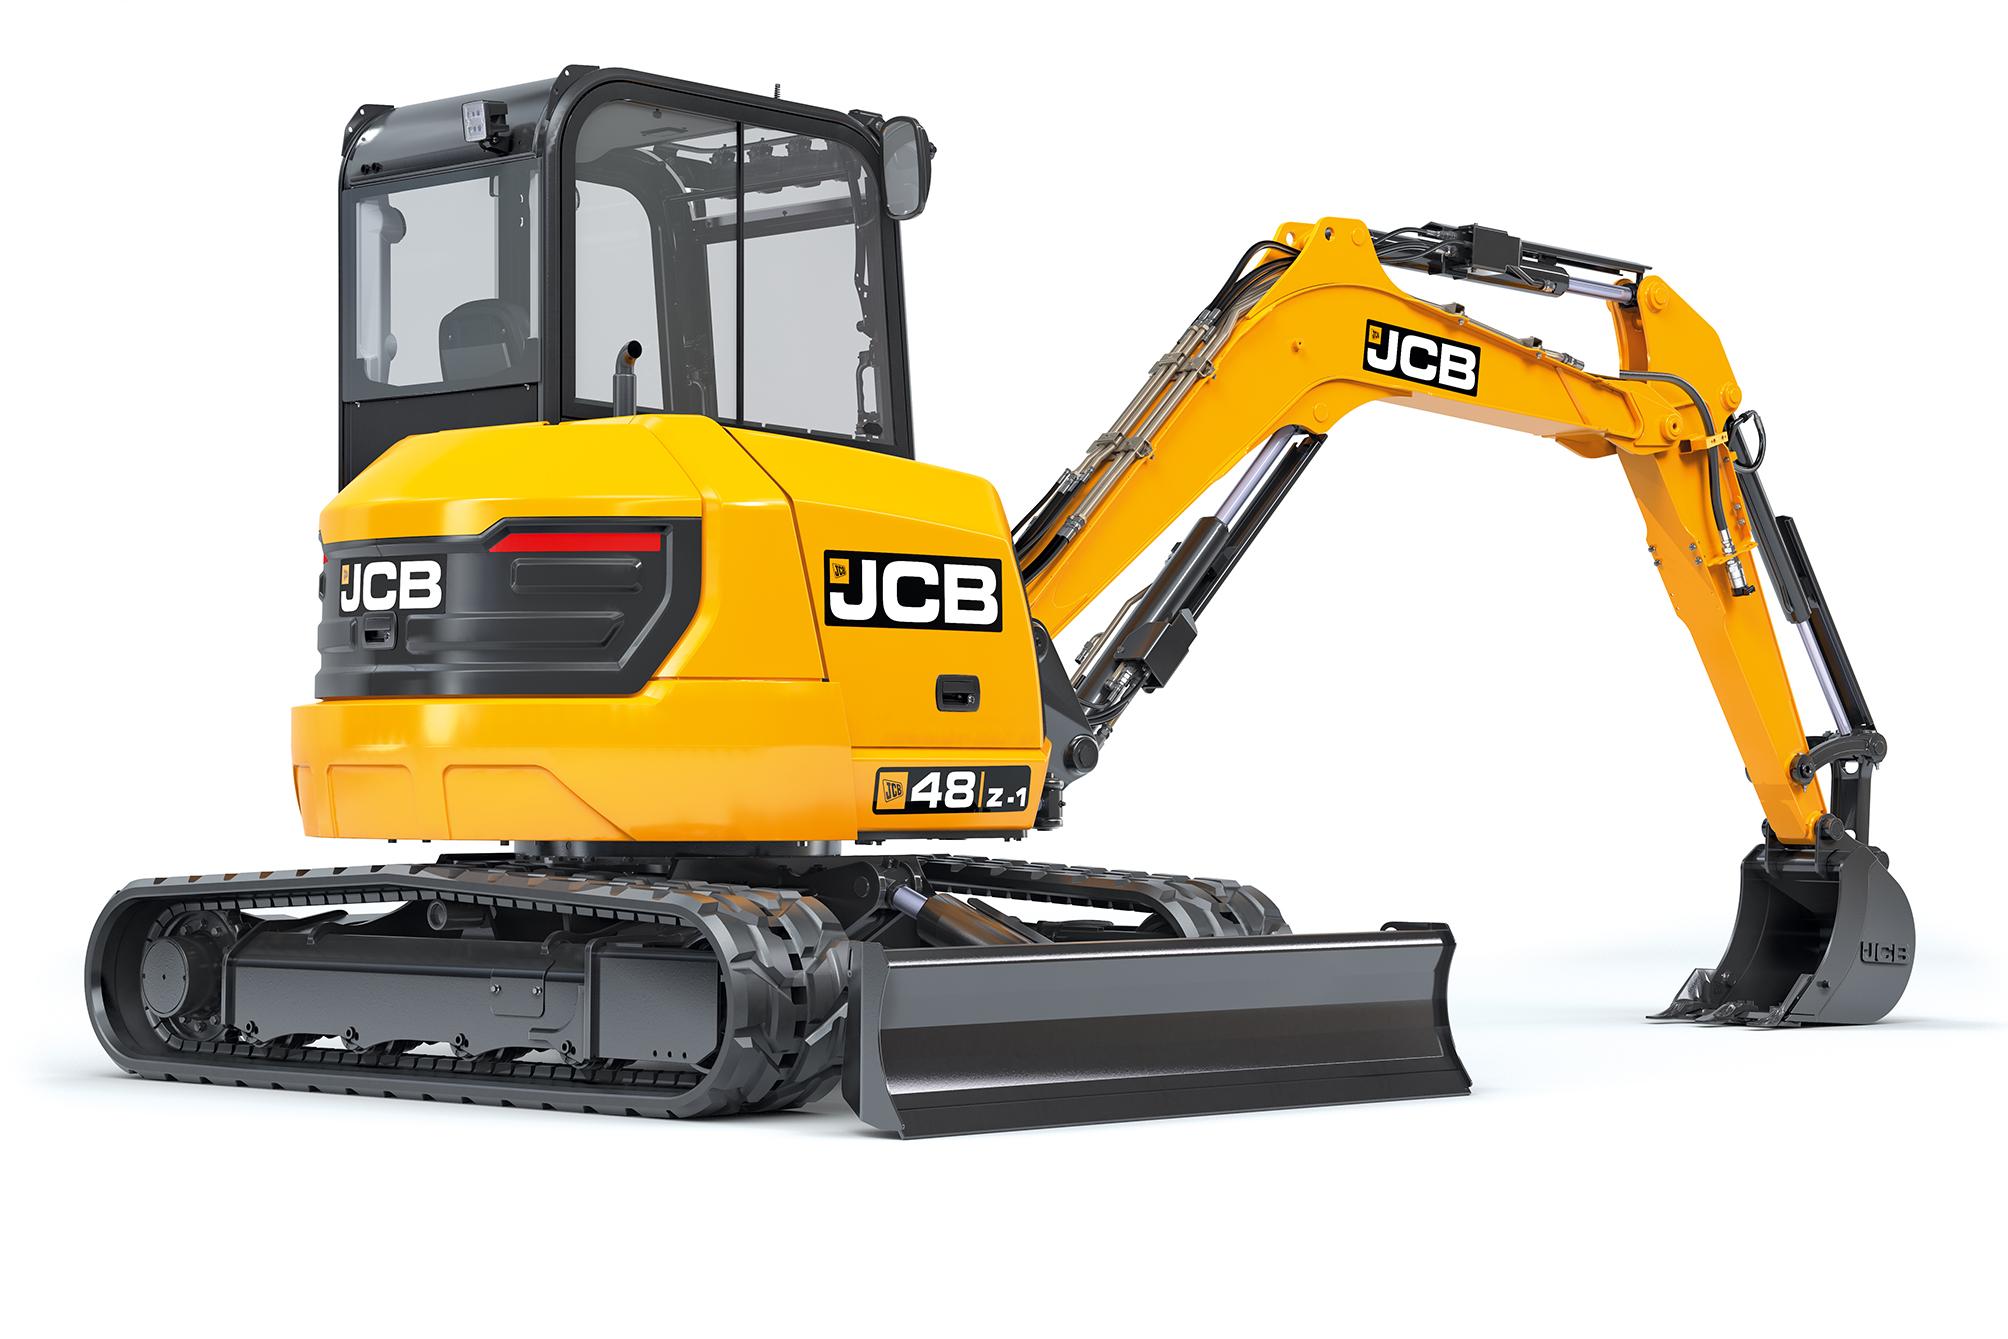 5T Tracked Excavator